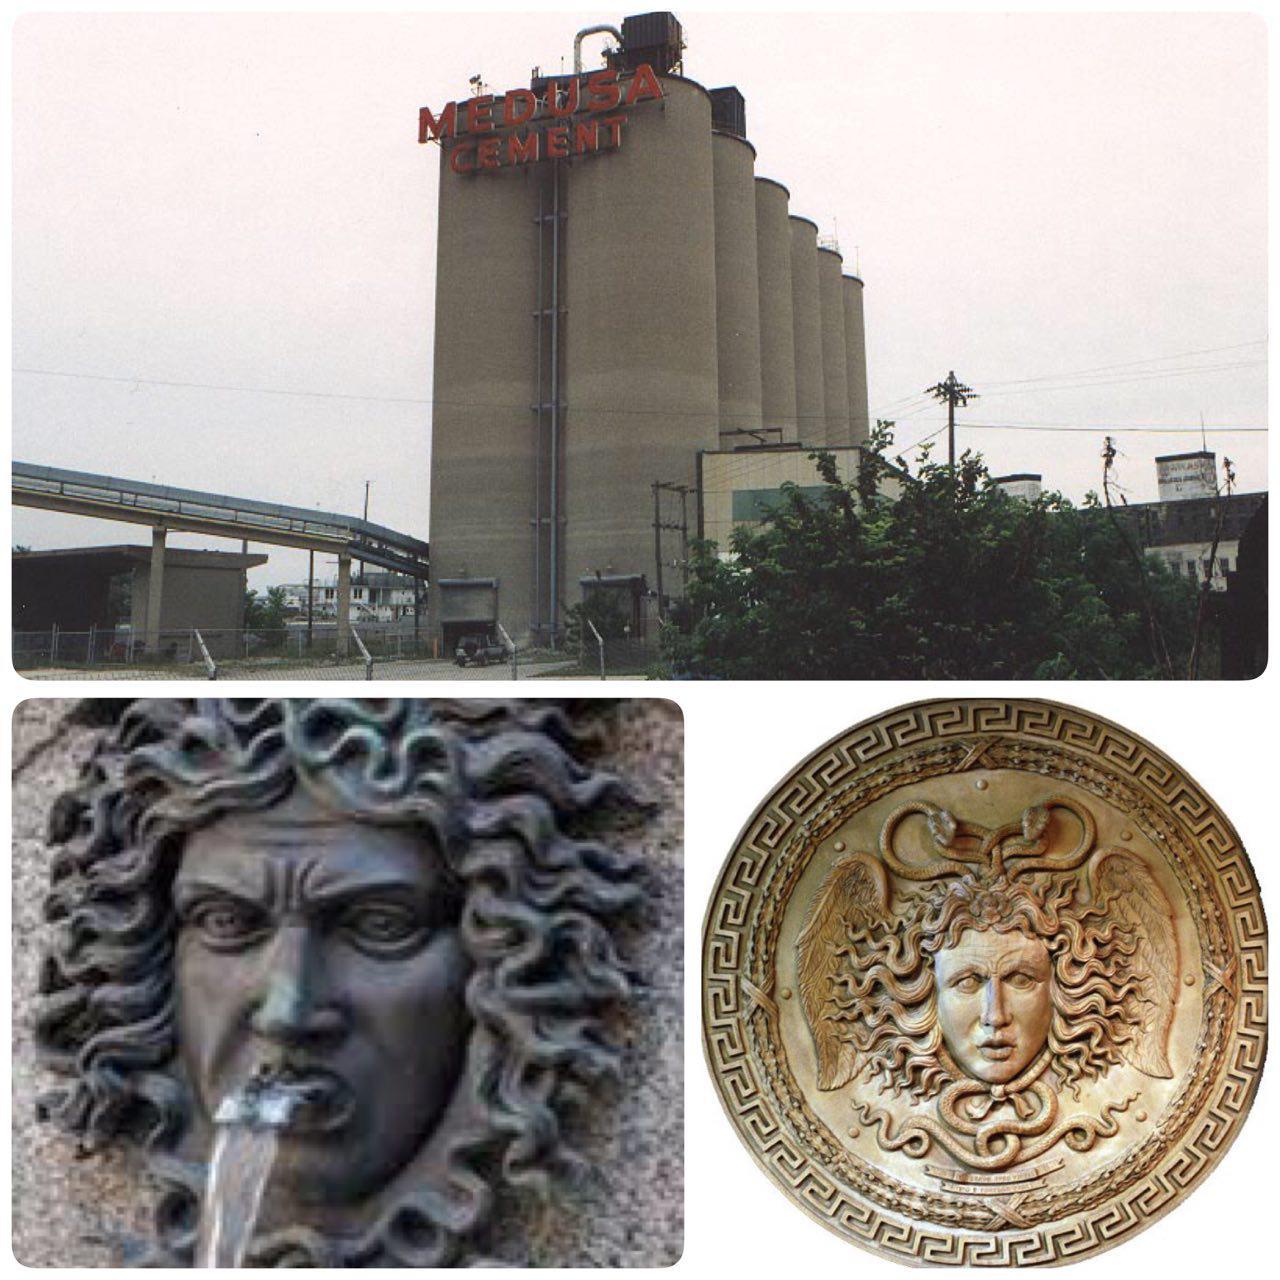 Medousa greek mythology